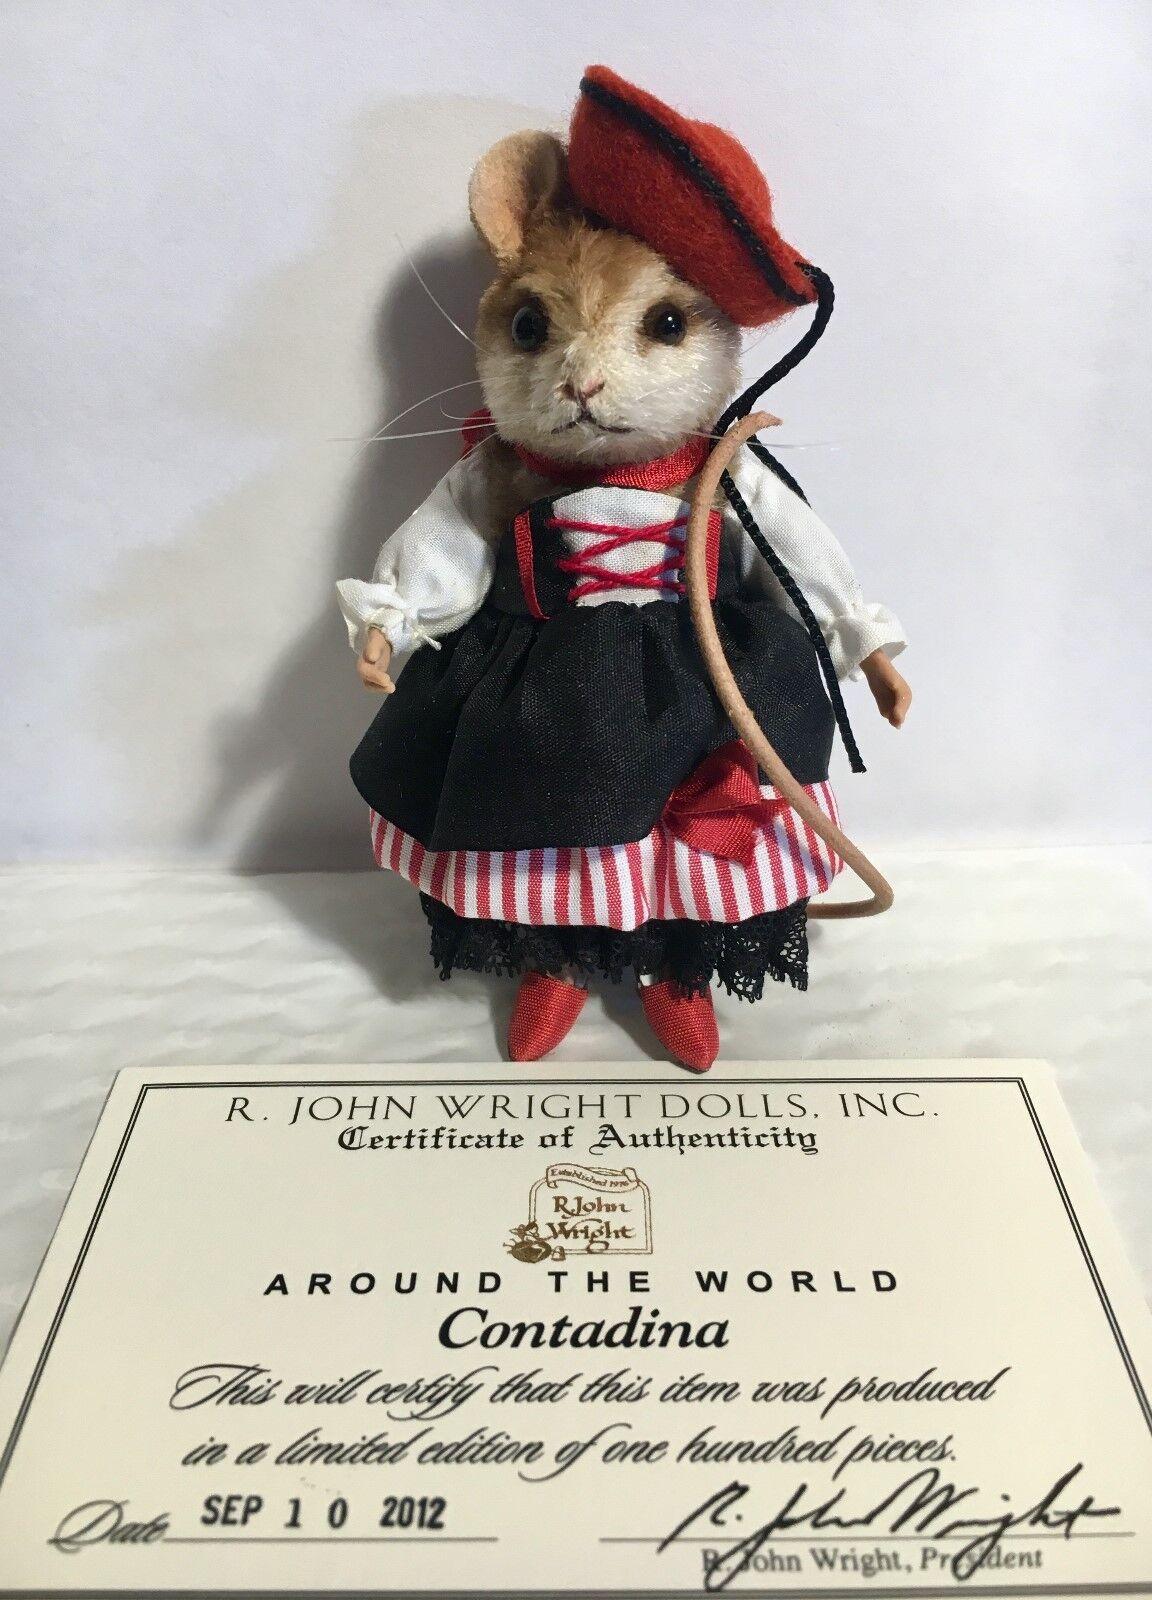 R John Wright ratones-contadina edición limitada de 100 piezas